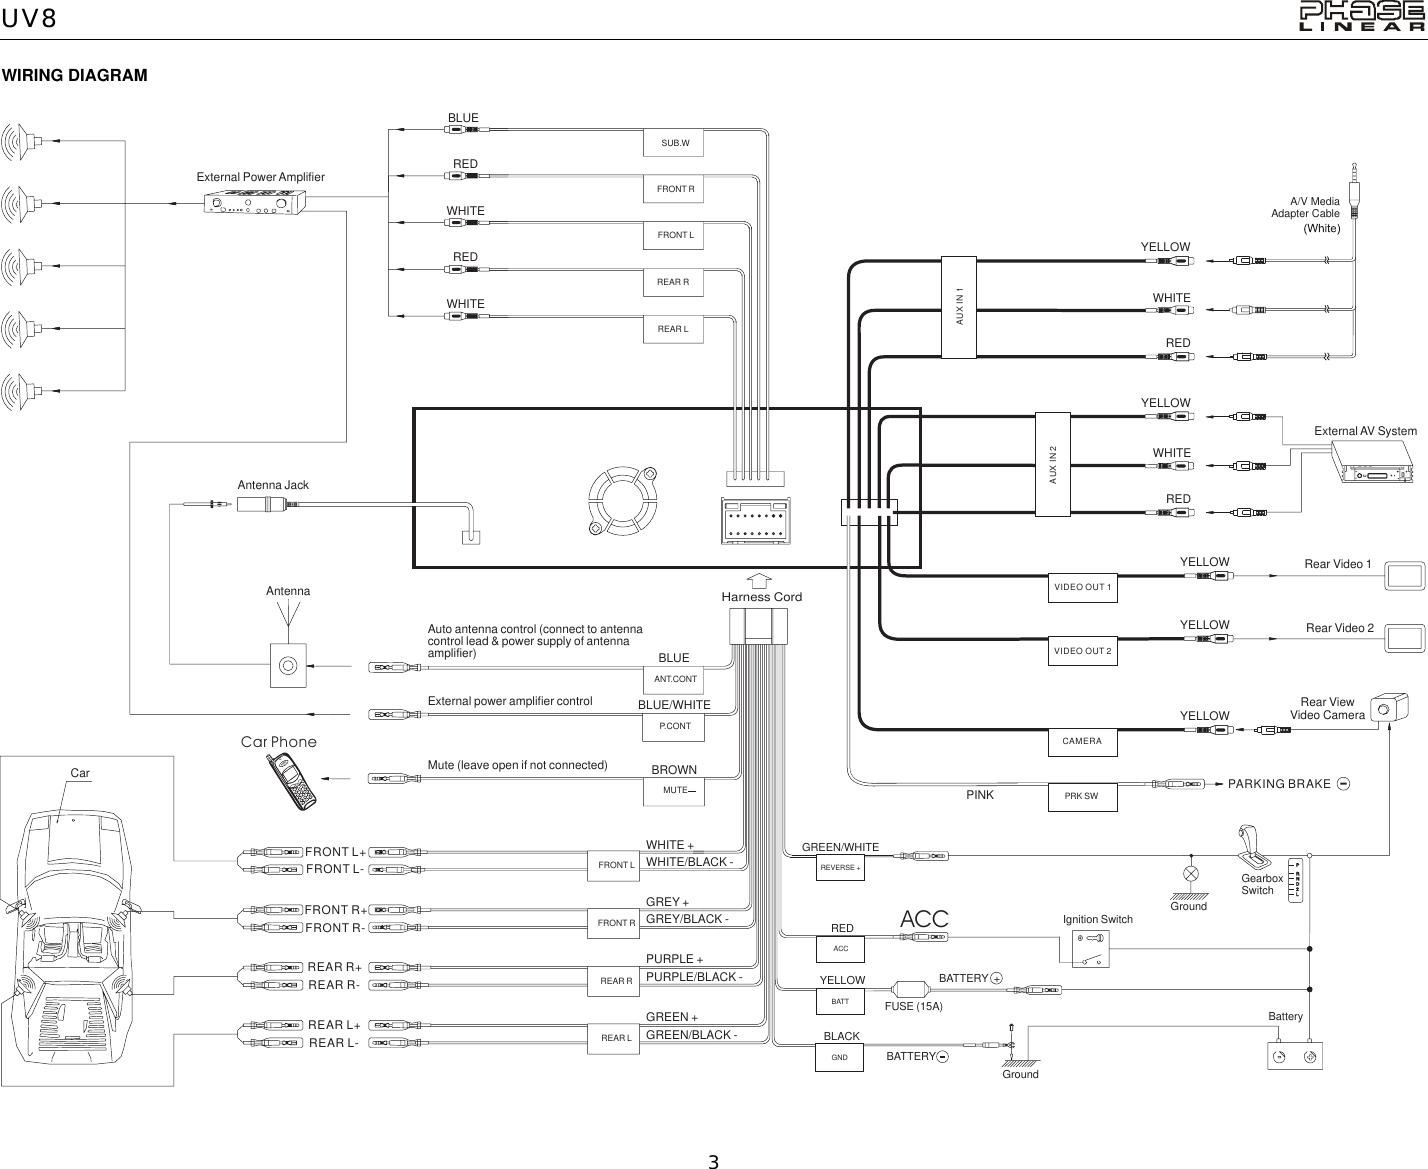 saturn 21025330 radio wiring harness color code external engine 948  1098 external engine engine 2003 chrysler pt  external engine 948  1098 external